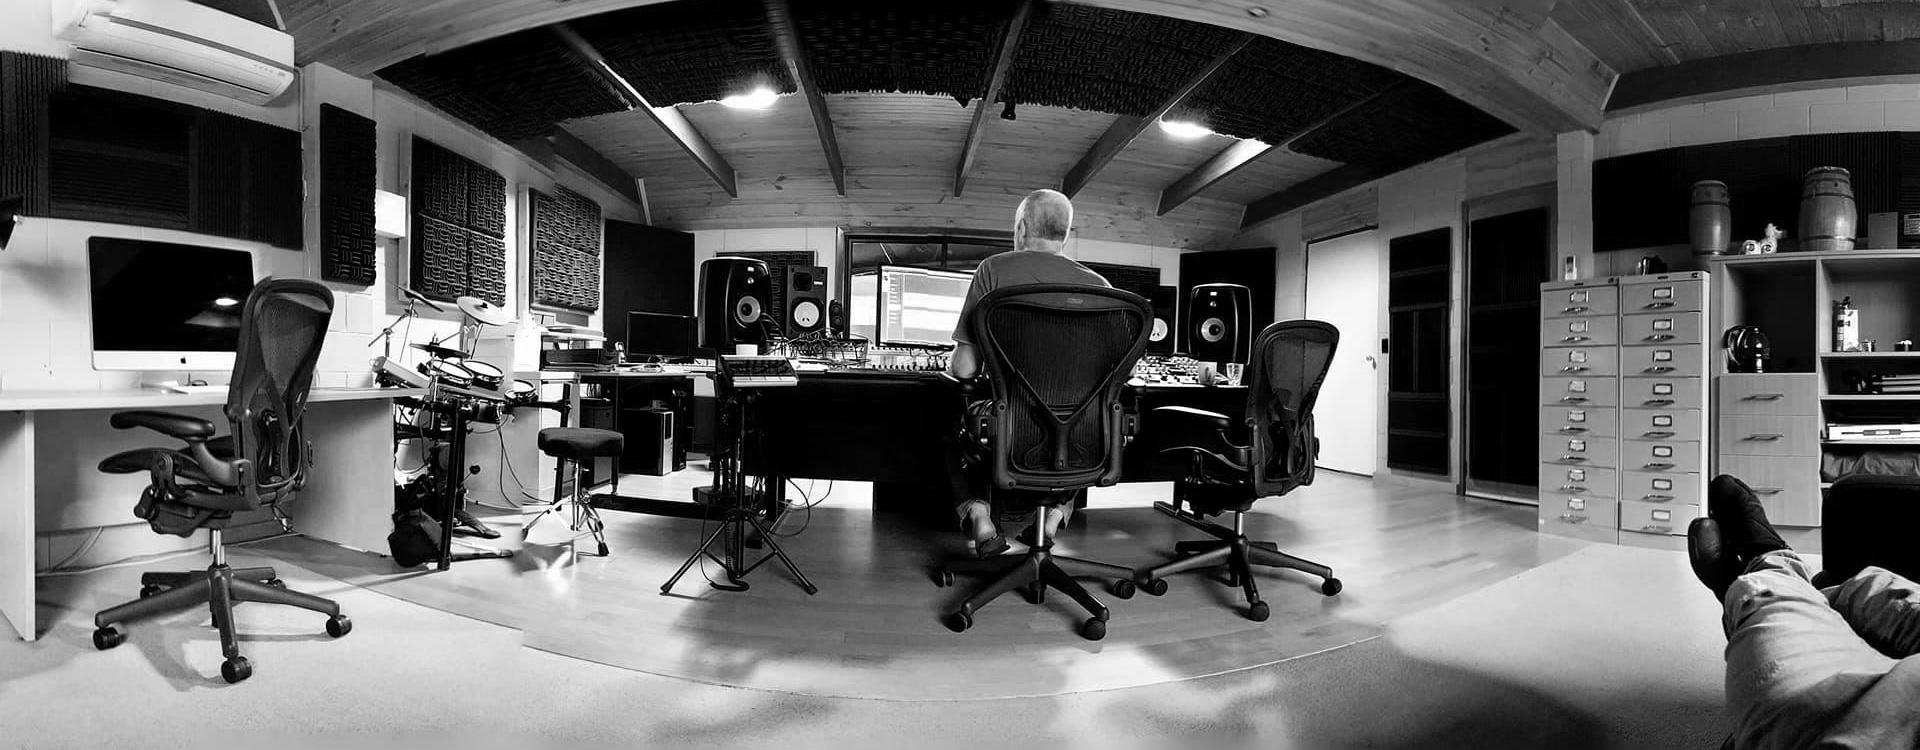 State-of-the-art recording studio facility